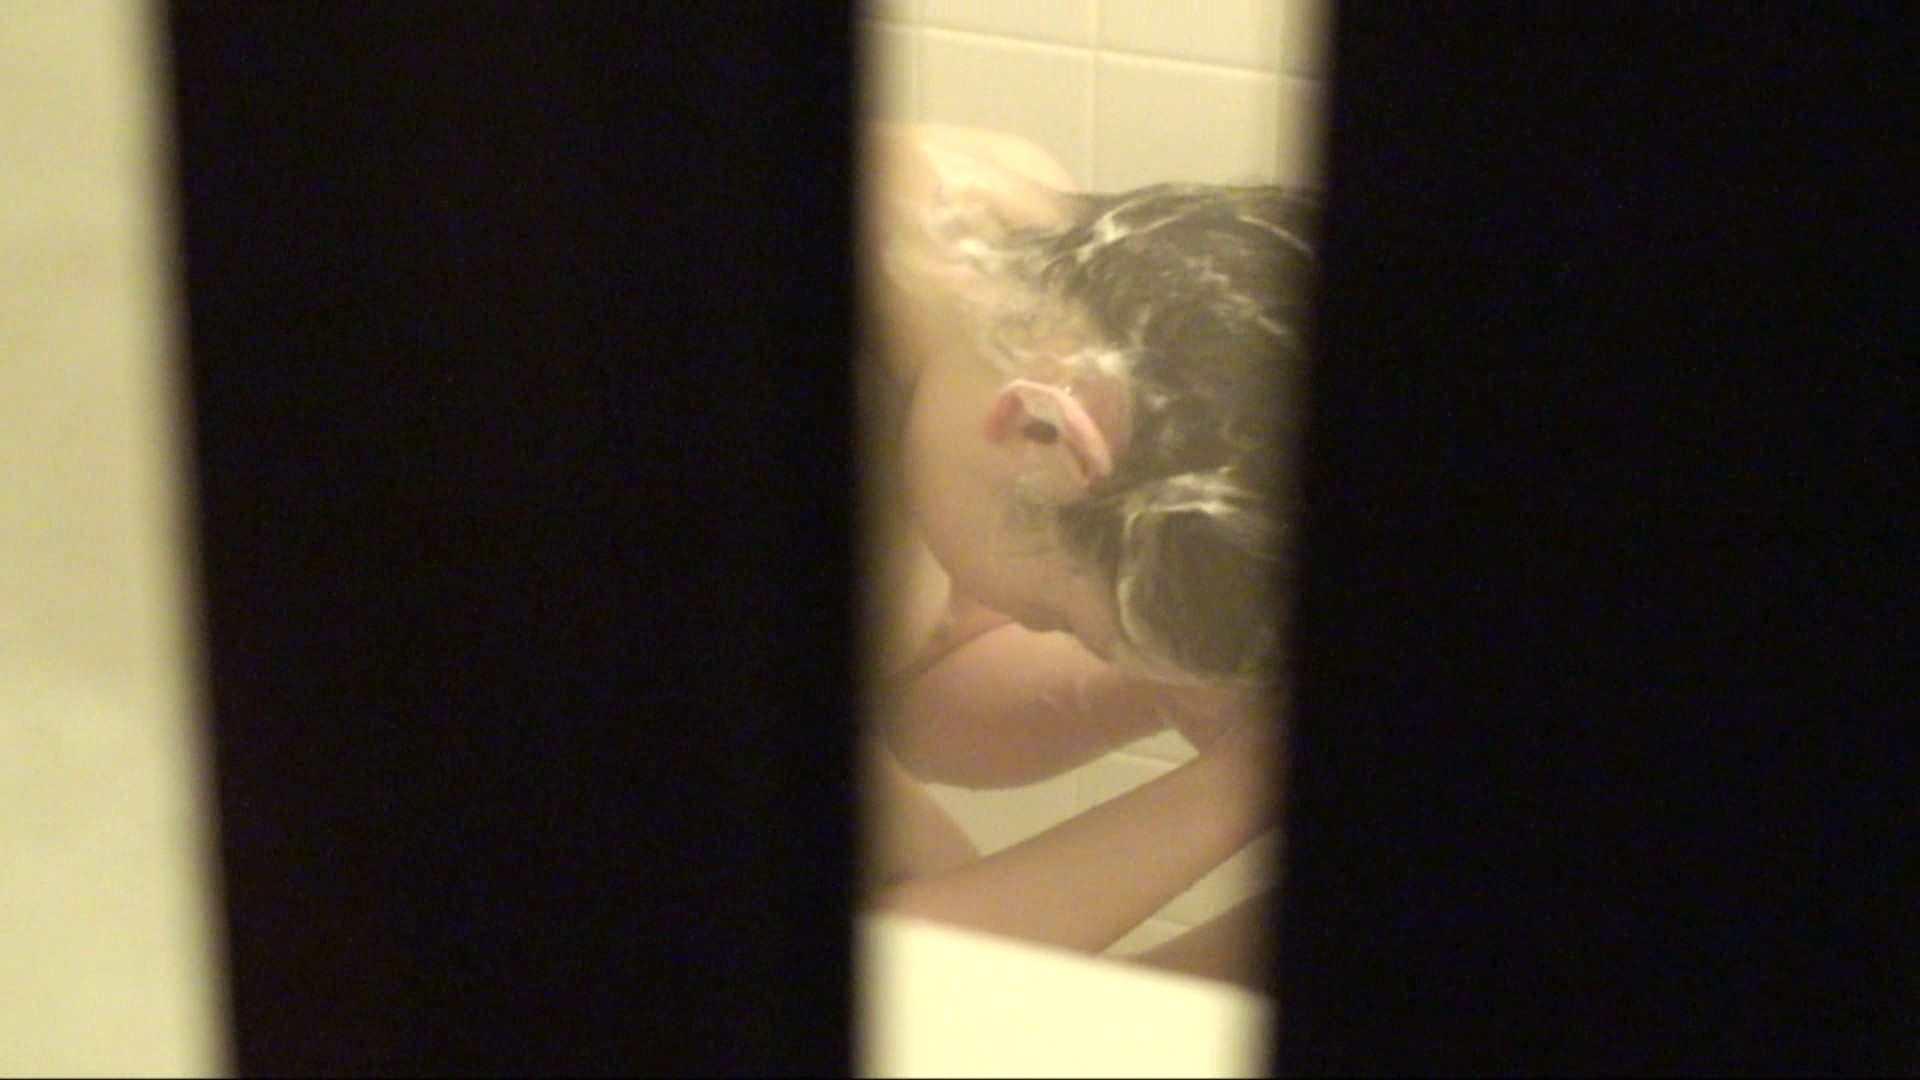 vol.02超可愛すぎる彼女の裸体をハイビジョンで!至近距離での眺め最高! 美人   民家  78pic 1